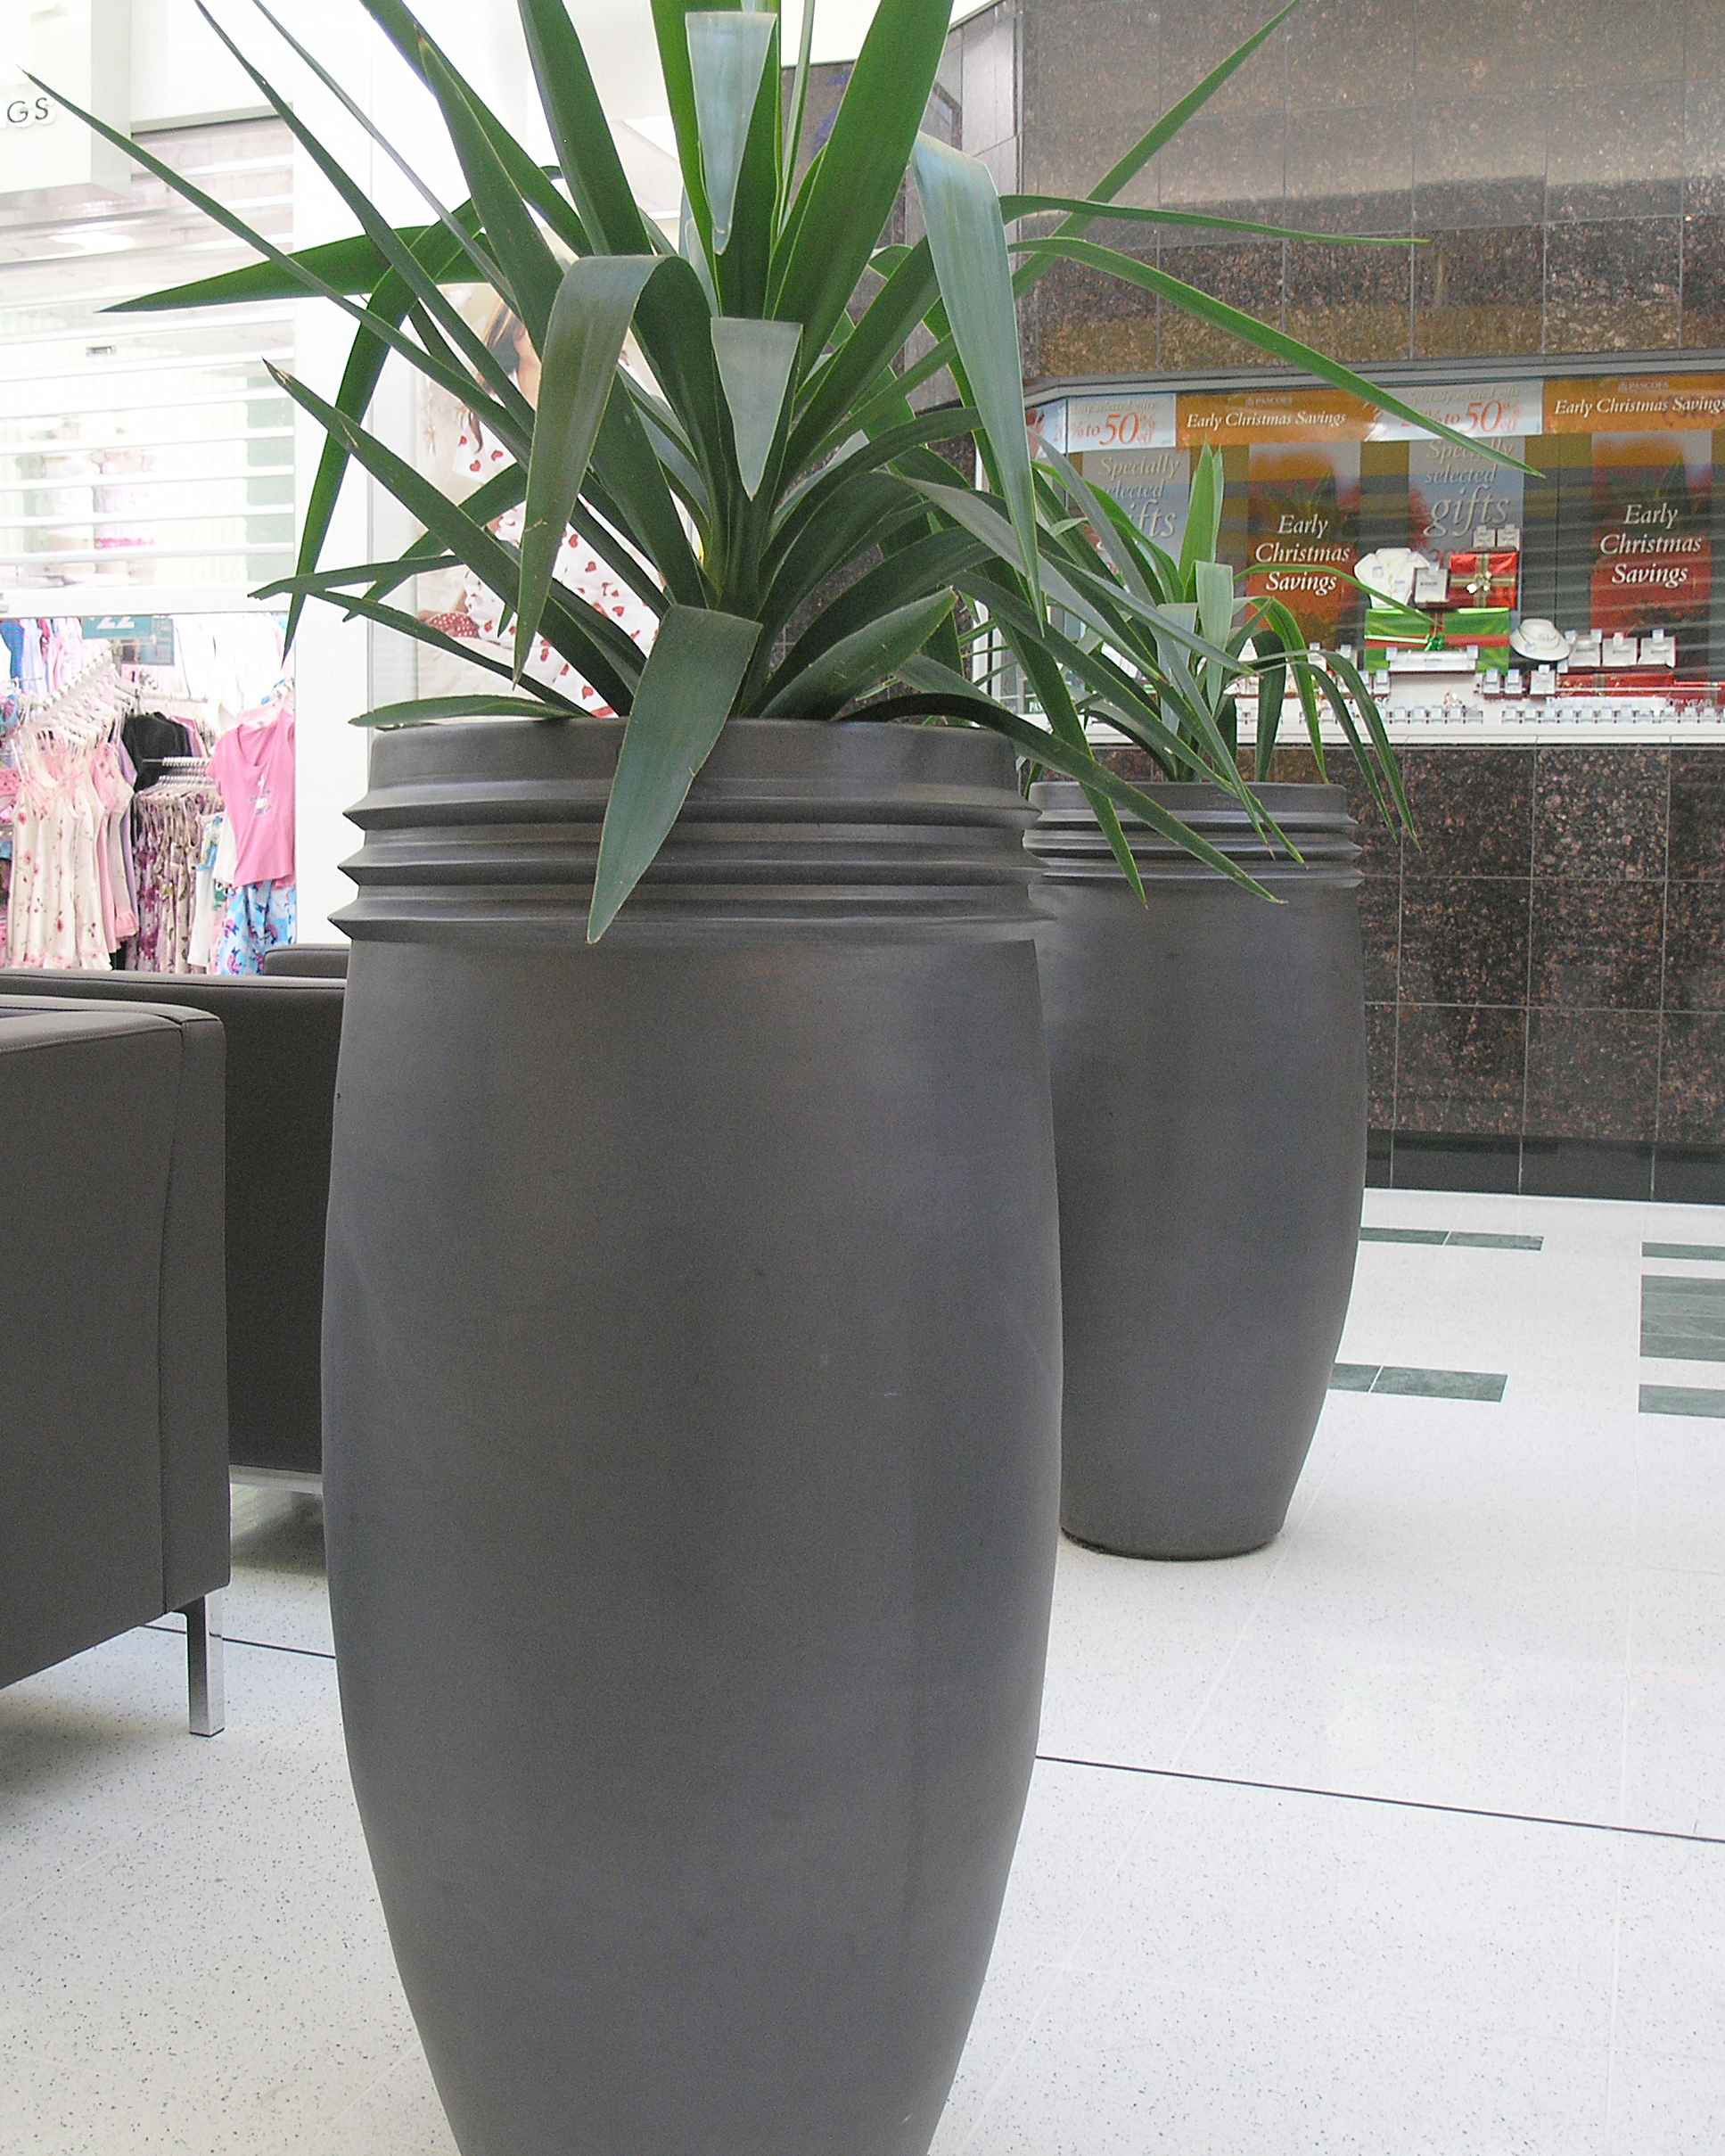 palms2 copy.jpg